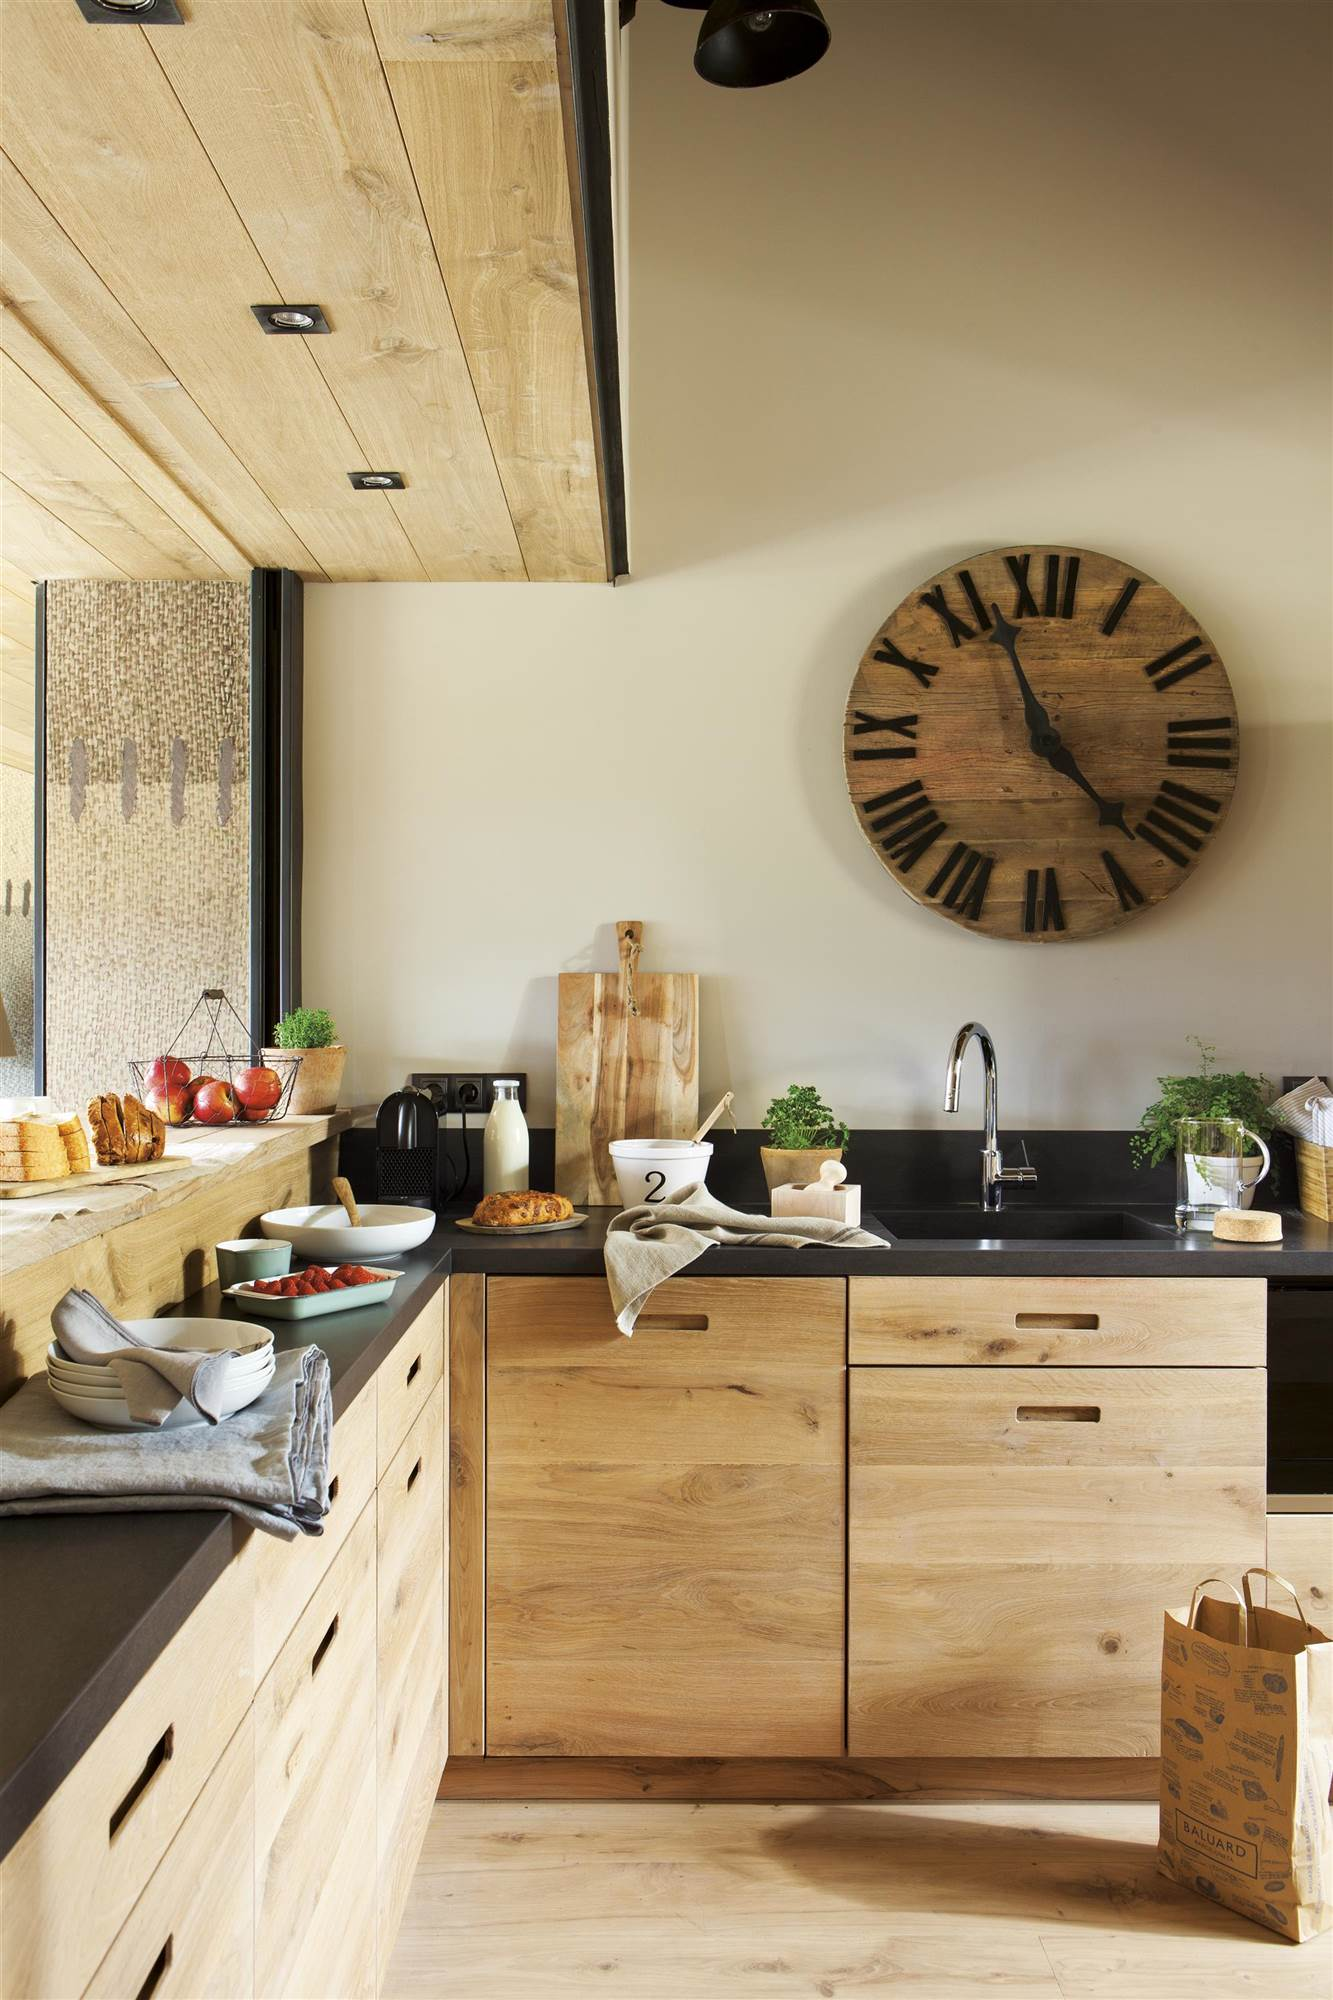 Encimeras de cocina bricomart elegant encimera de cocina for Bauhaus grifos cocina